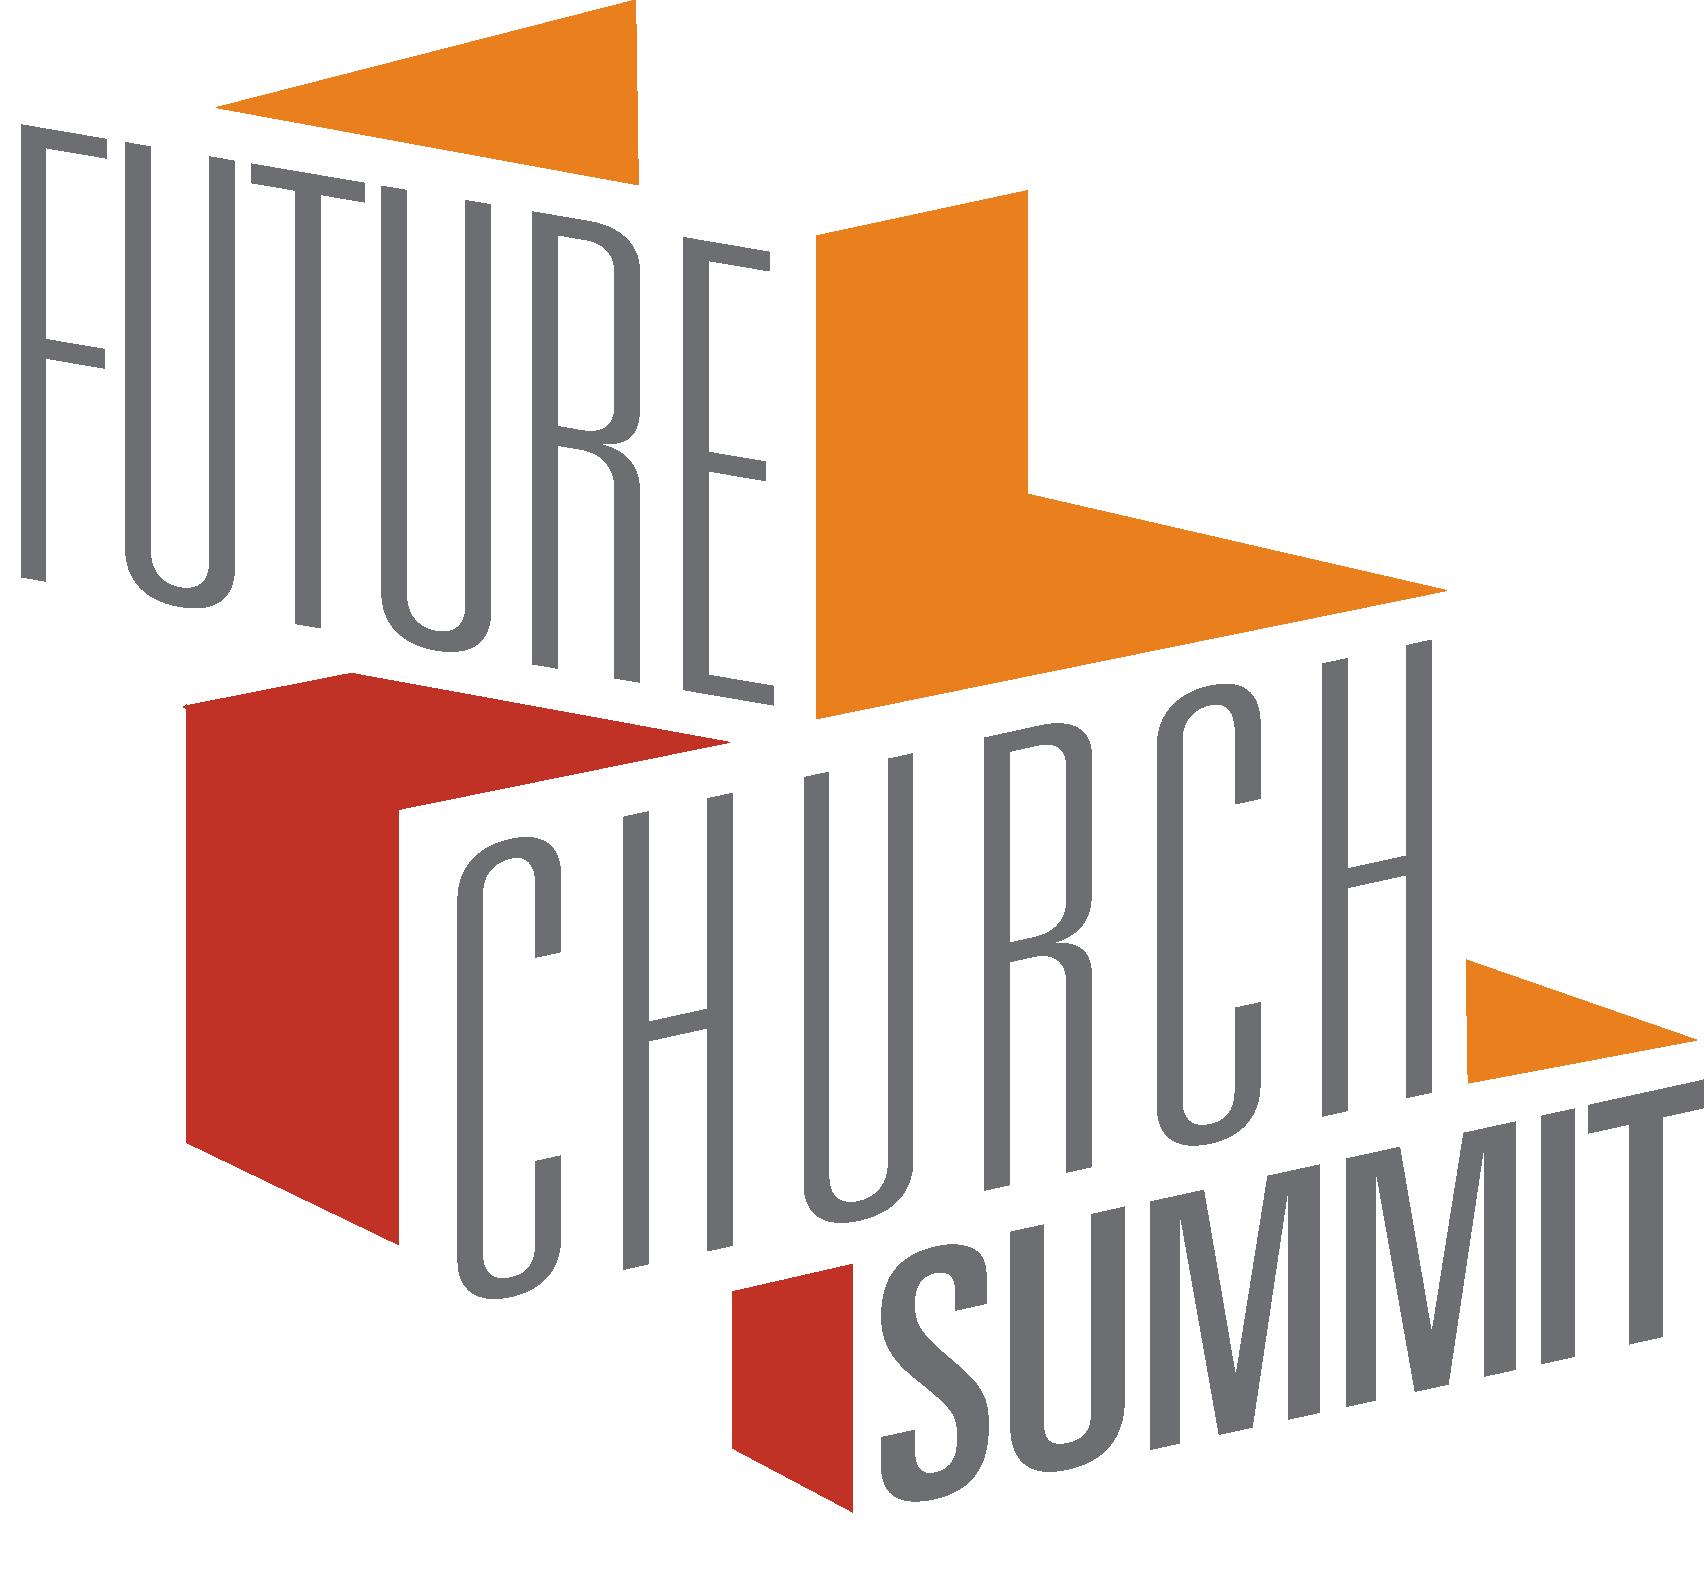 Future Church Summit